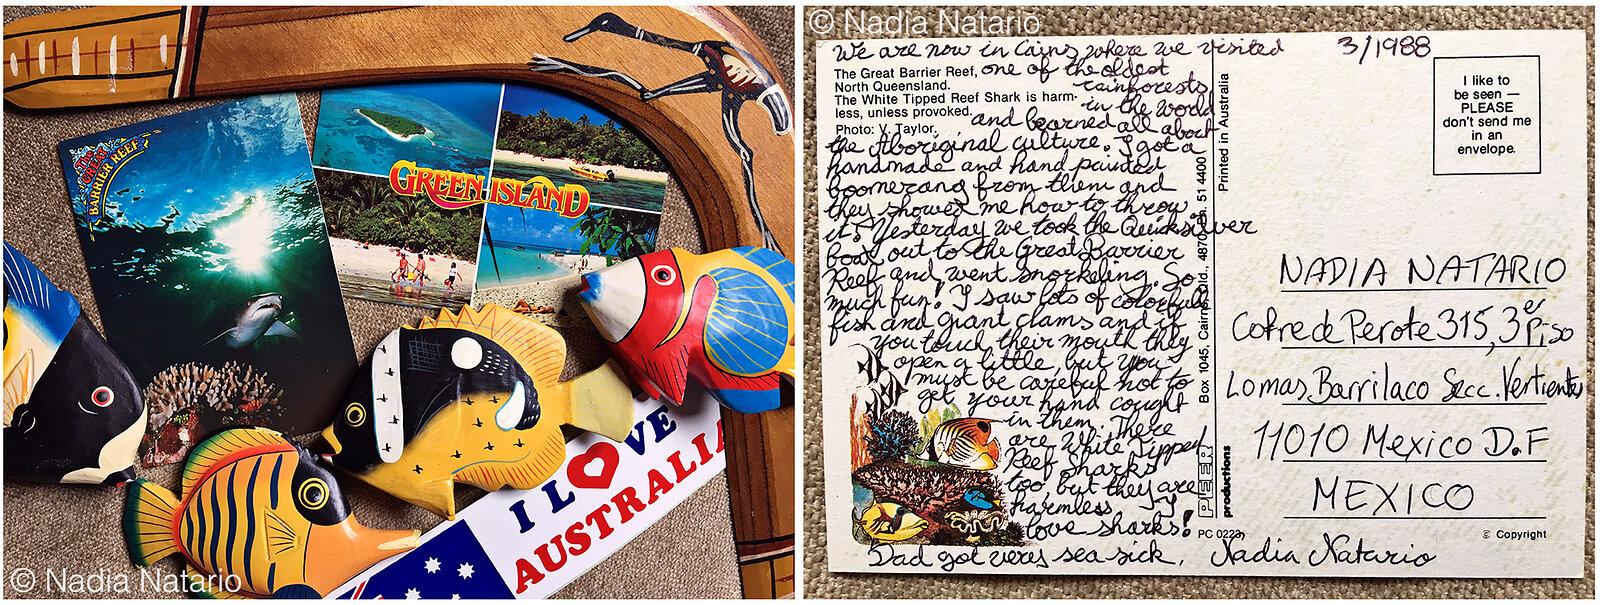 Postcards to Myself - Cairns, Australia, 1988